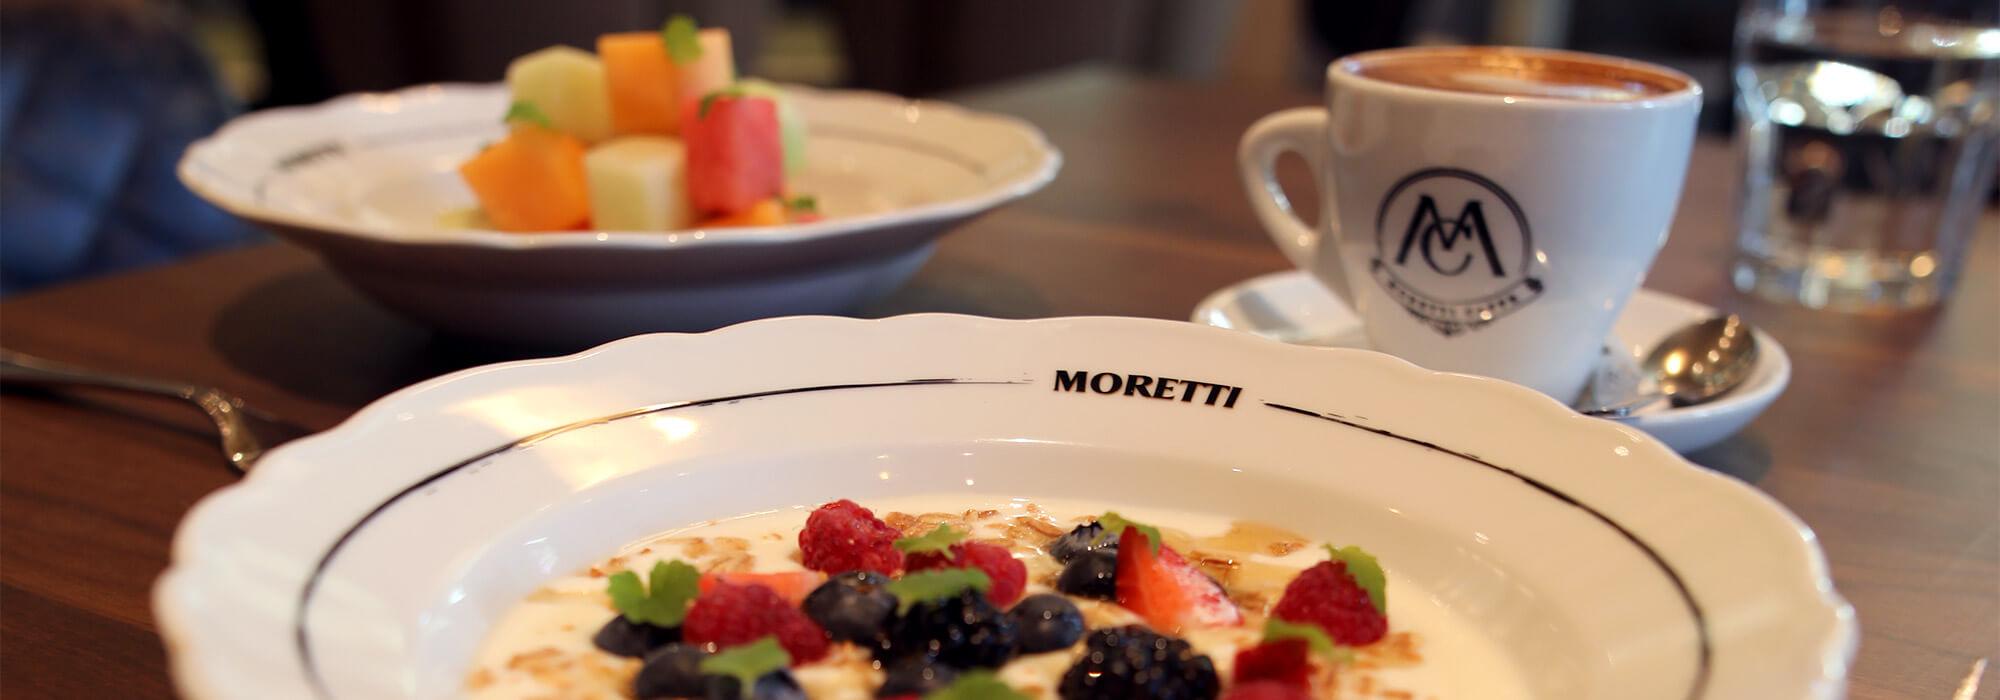 Breakfast at Moretti Restaurant